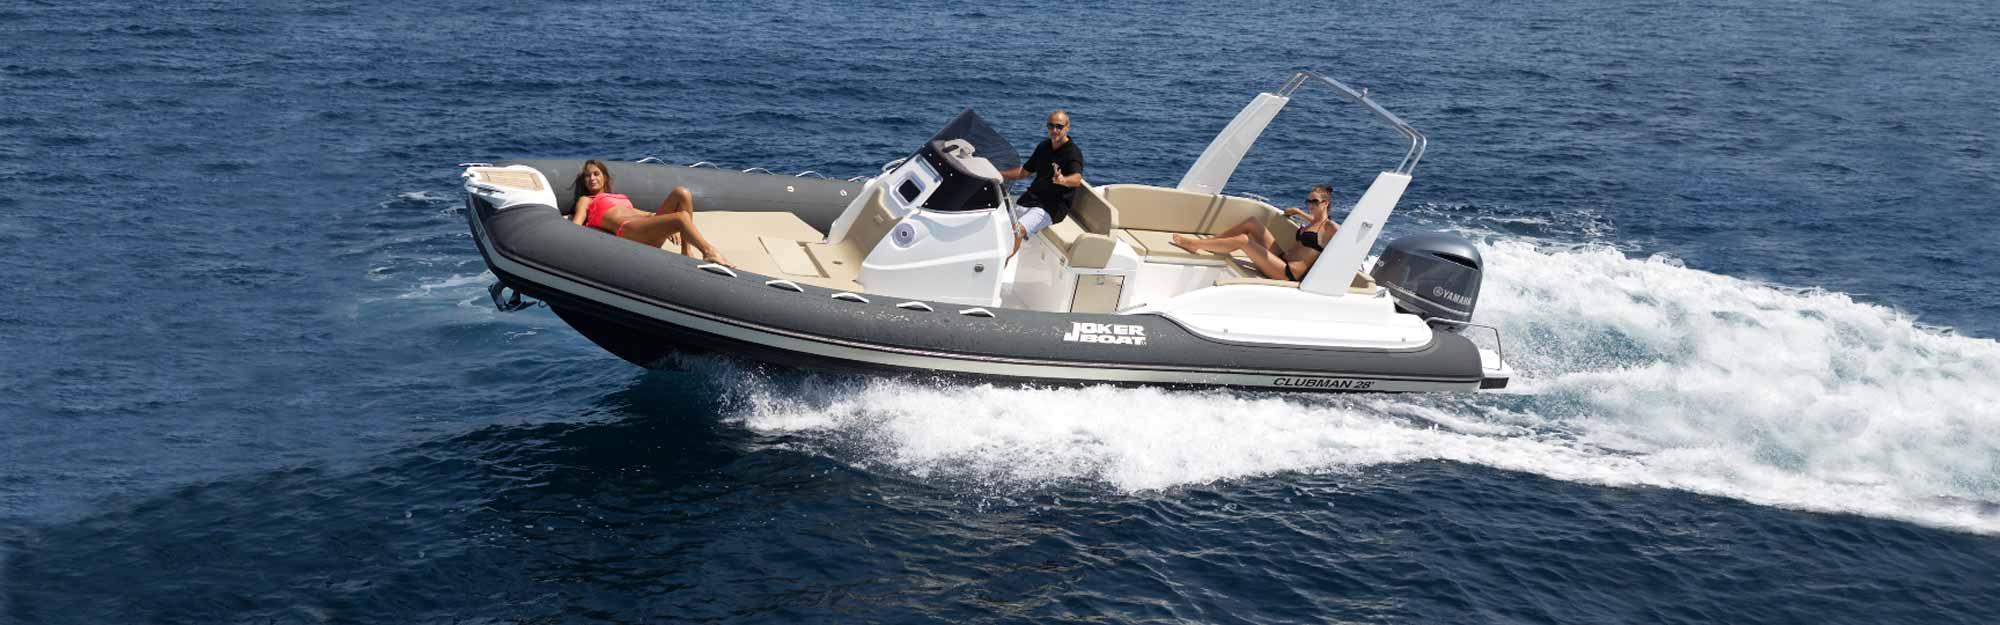 vitale-marine-vendita-gommoni-joker-boat